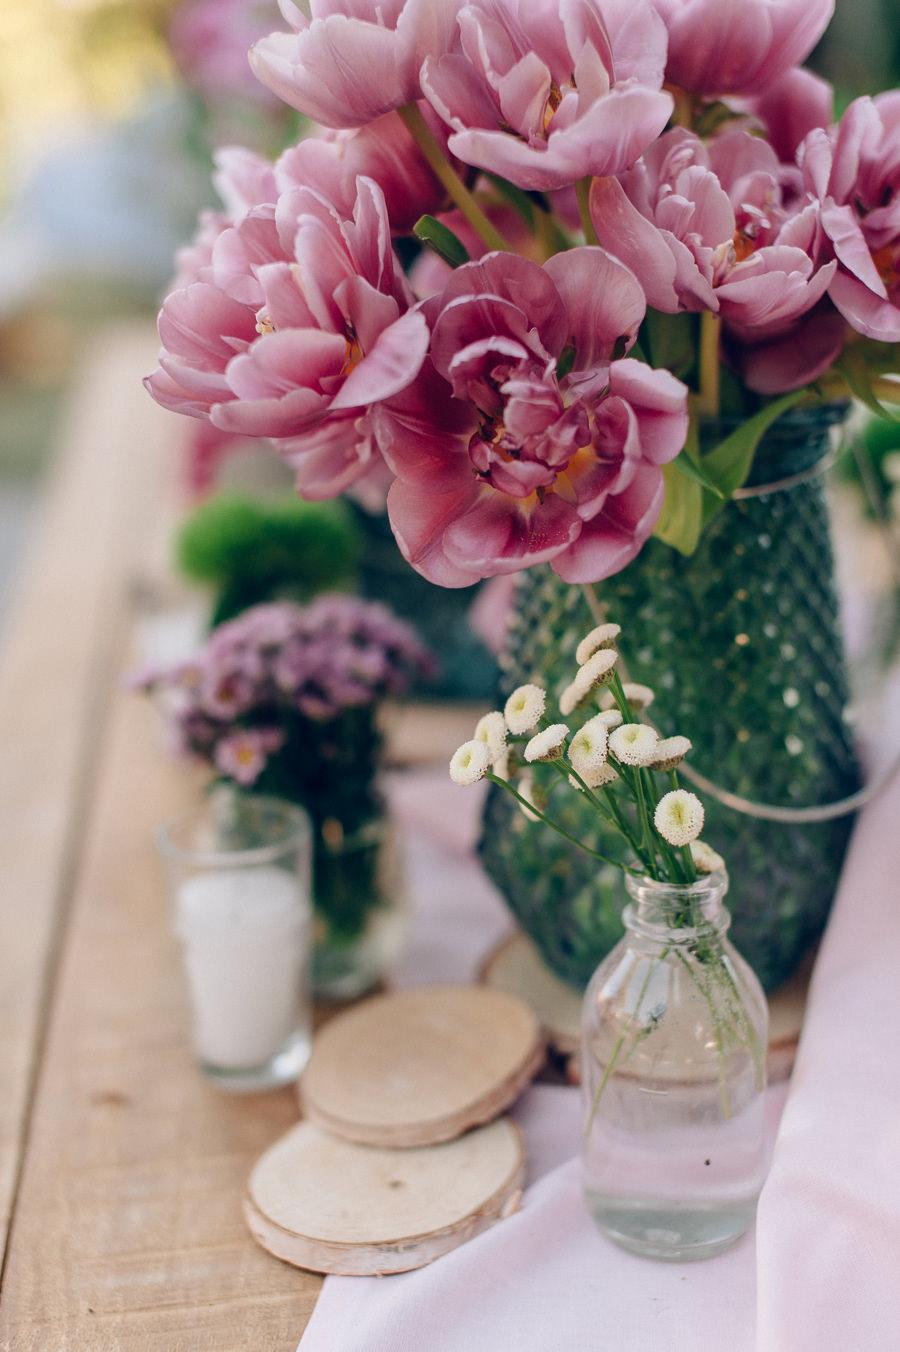 Flores para decorar tipis chill out 2